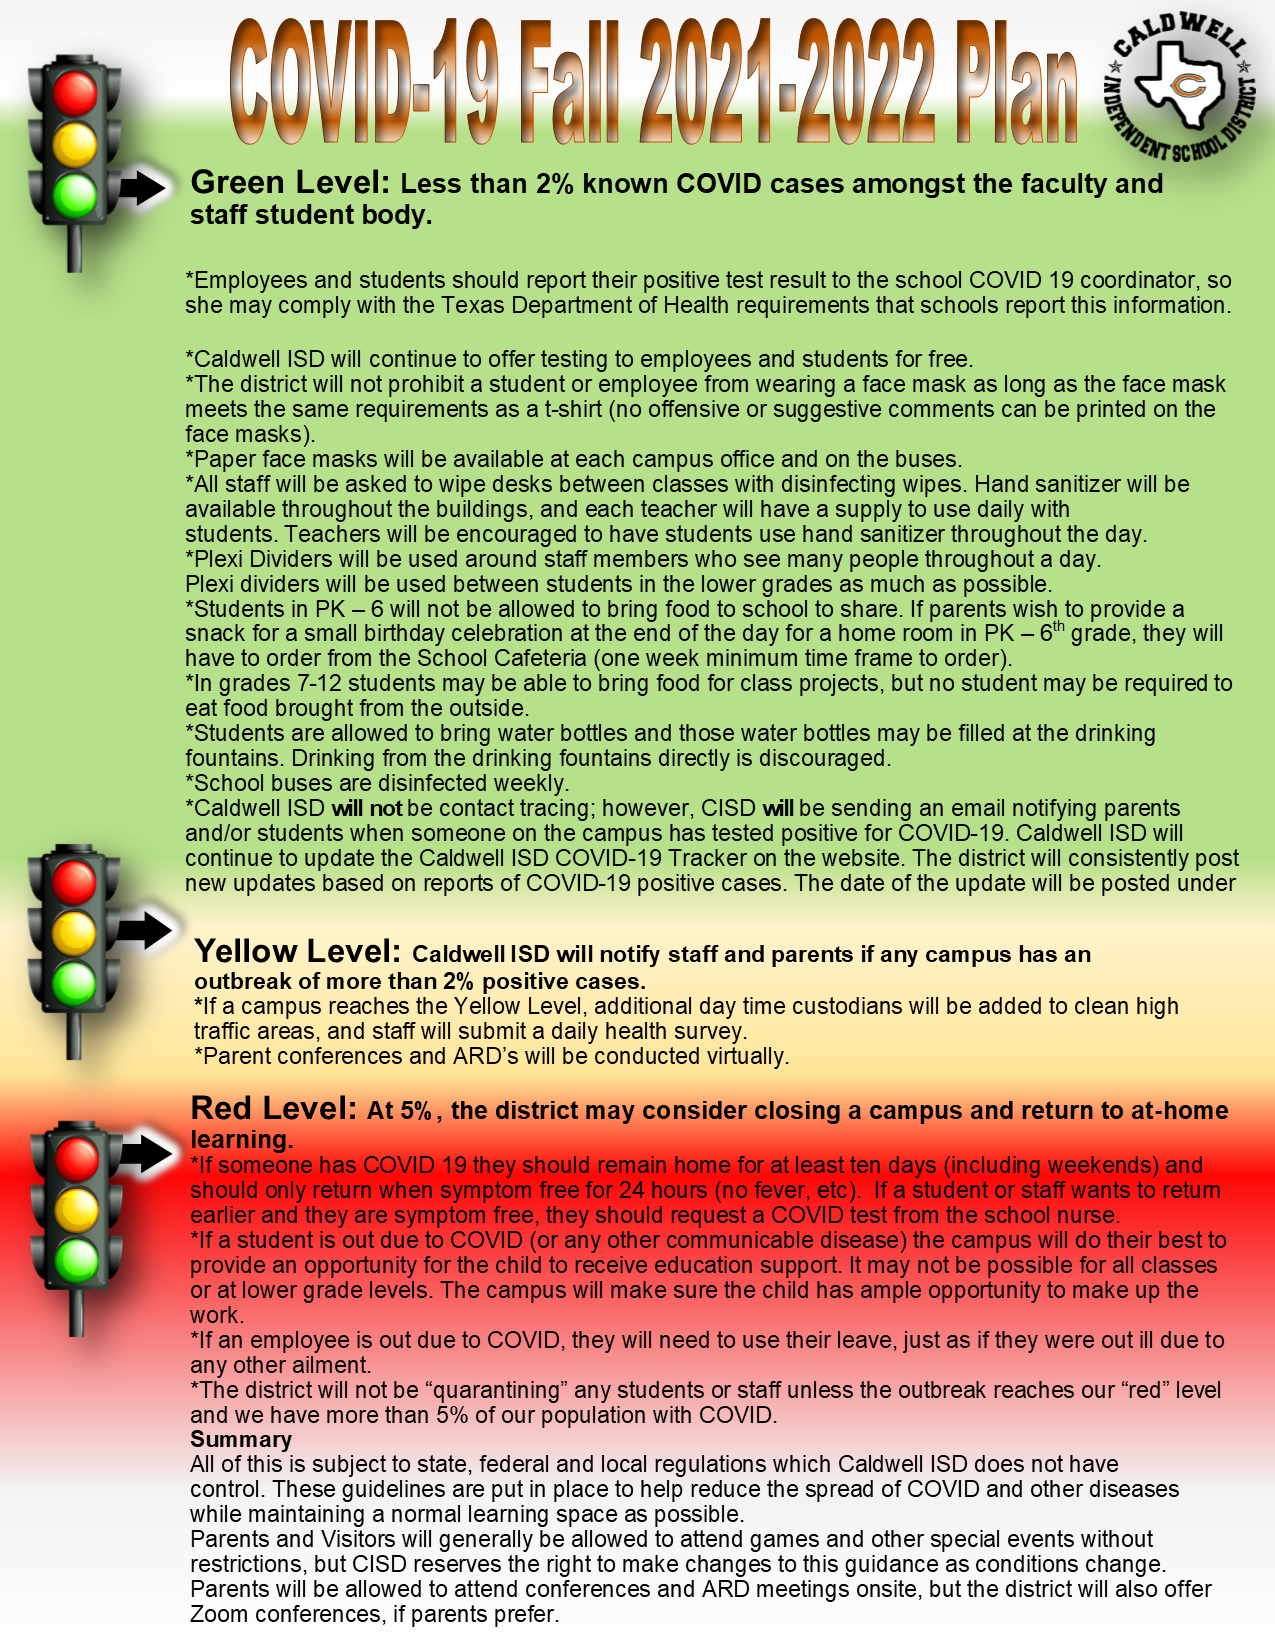 COVID-19 FALL 2021-2022 PLAN PDF PLAN LINKED ON PAGE